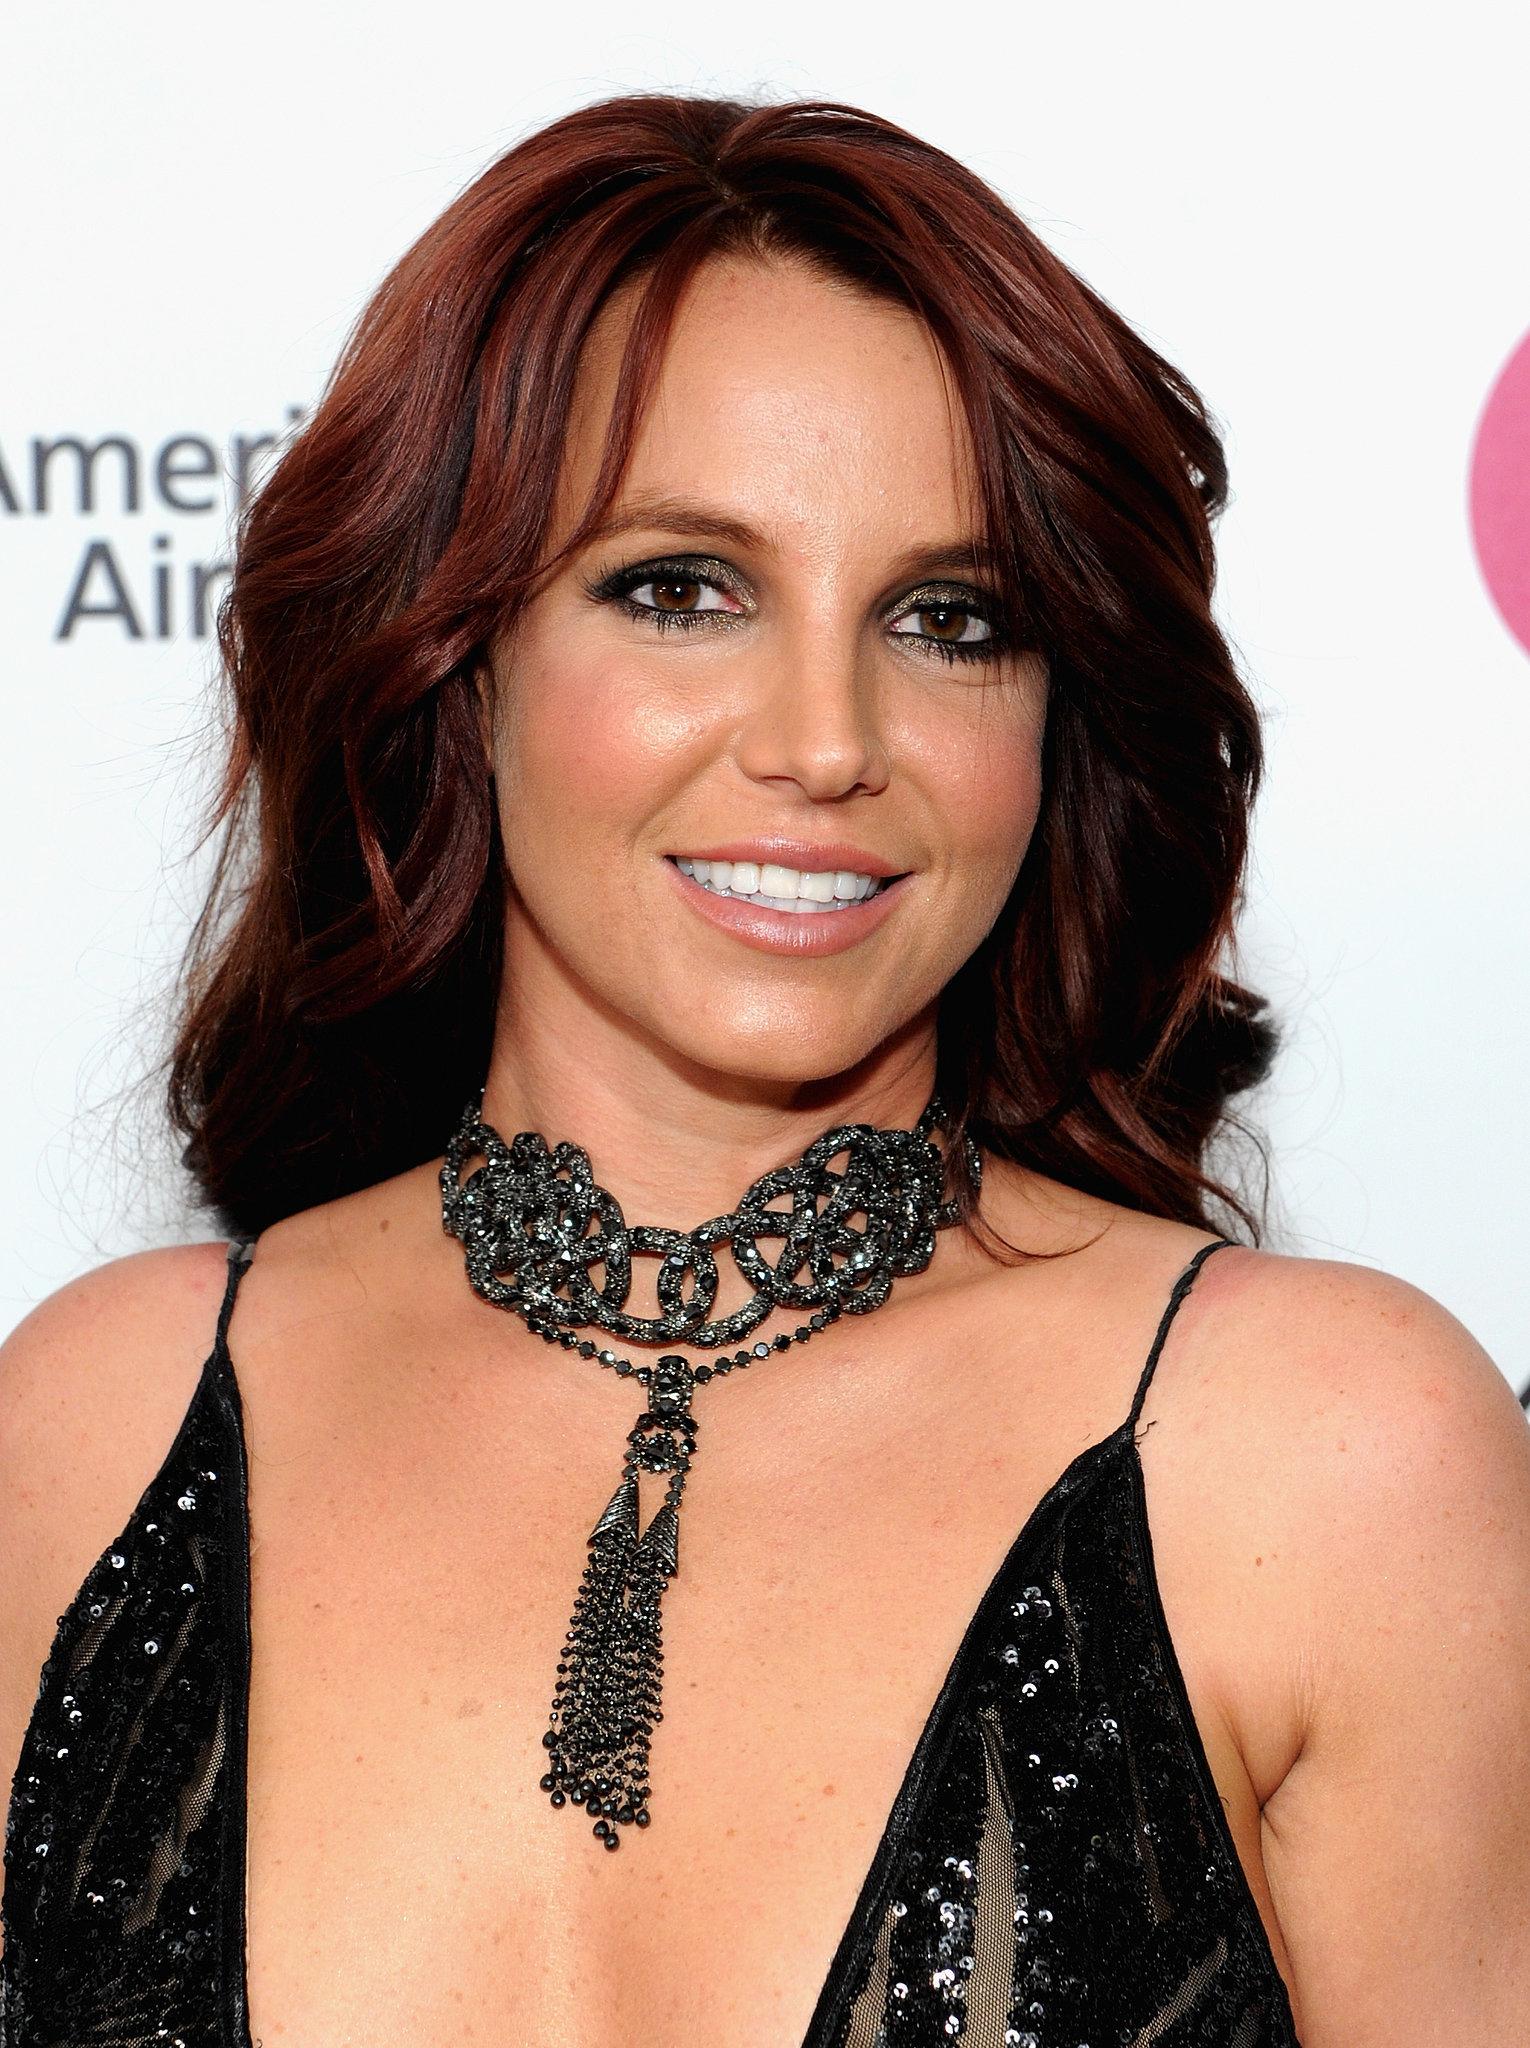 Britney Spears at Elton John Party